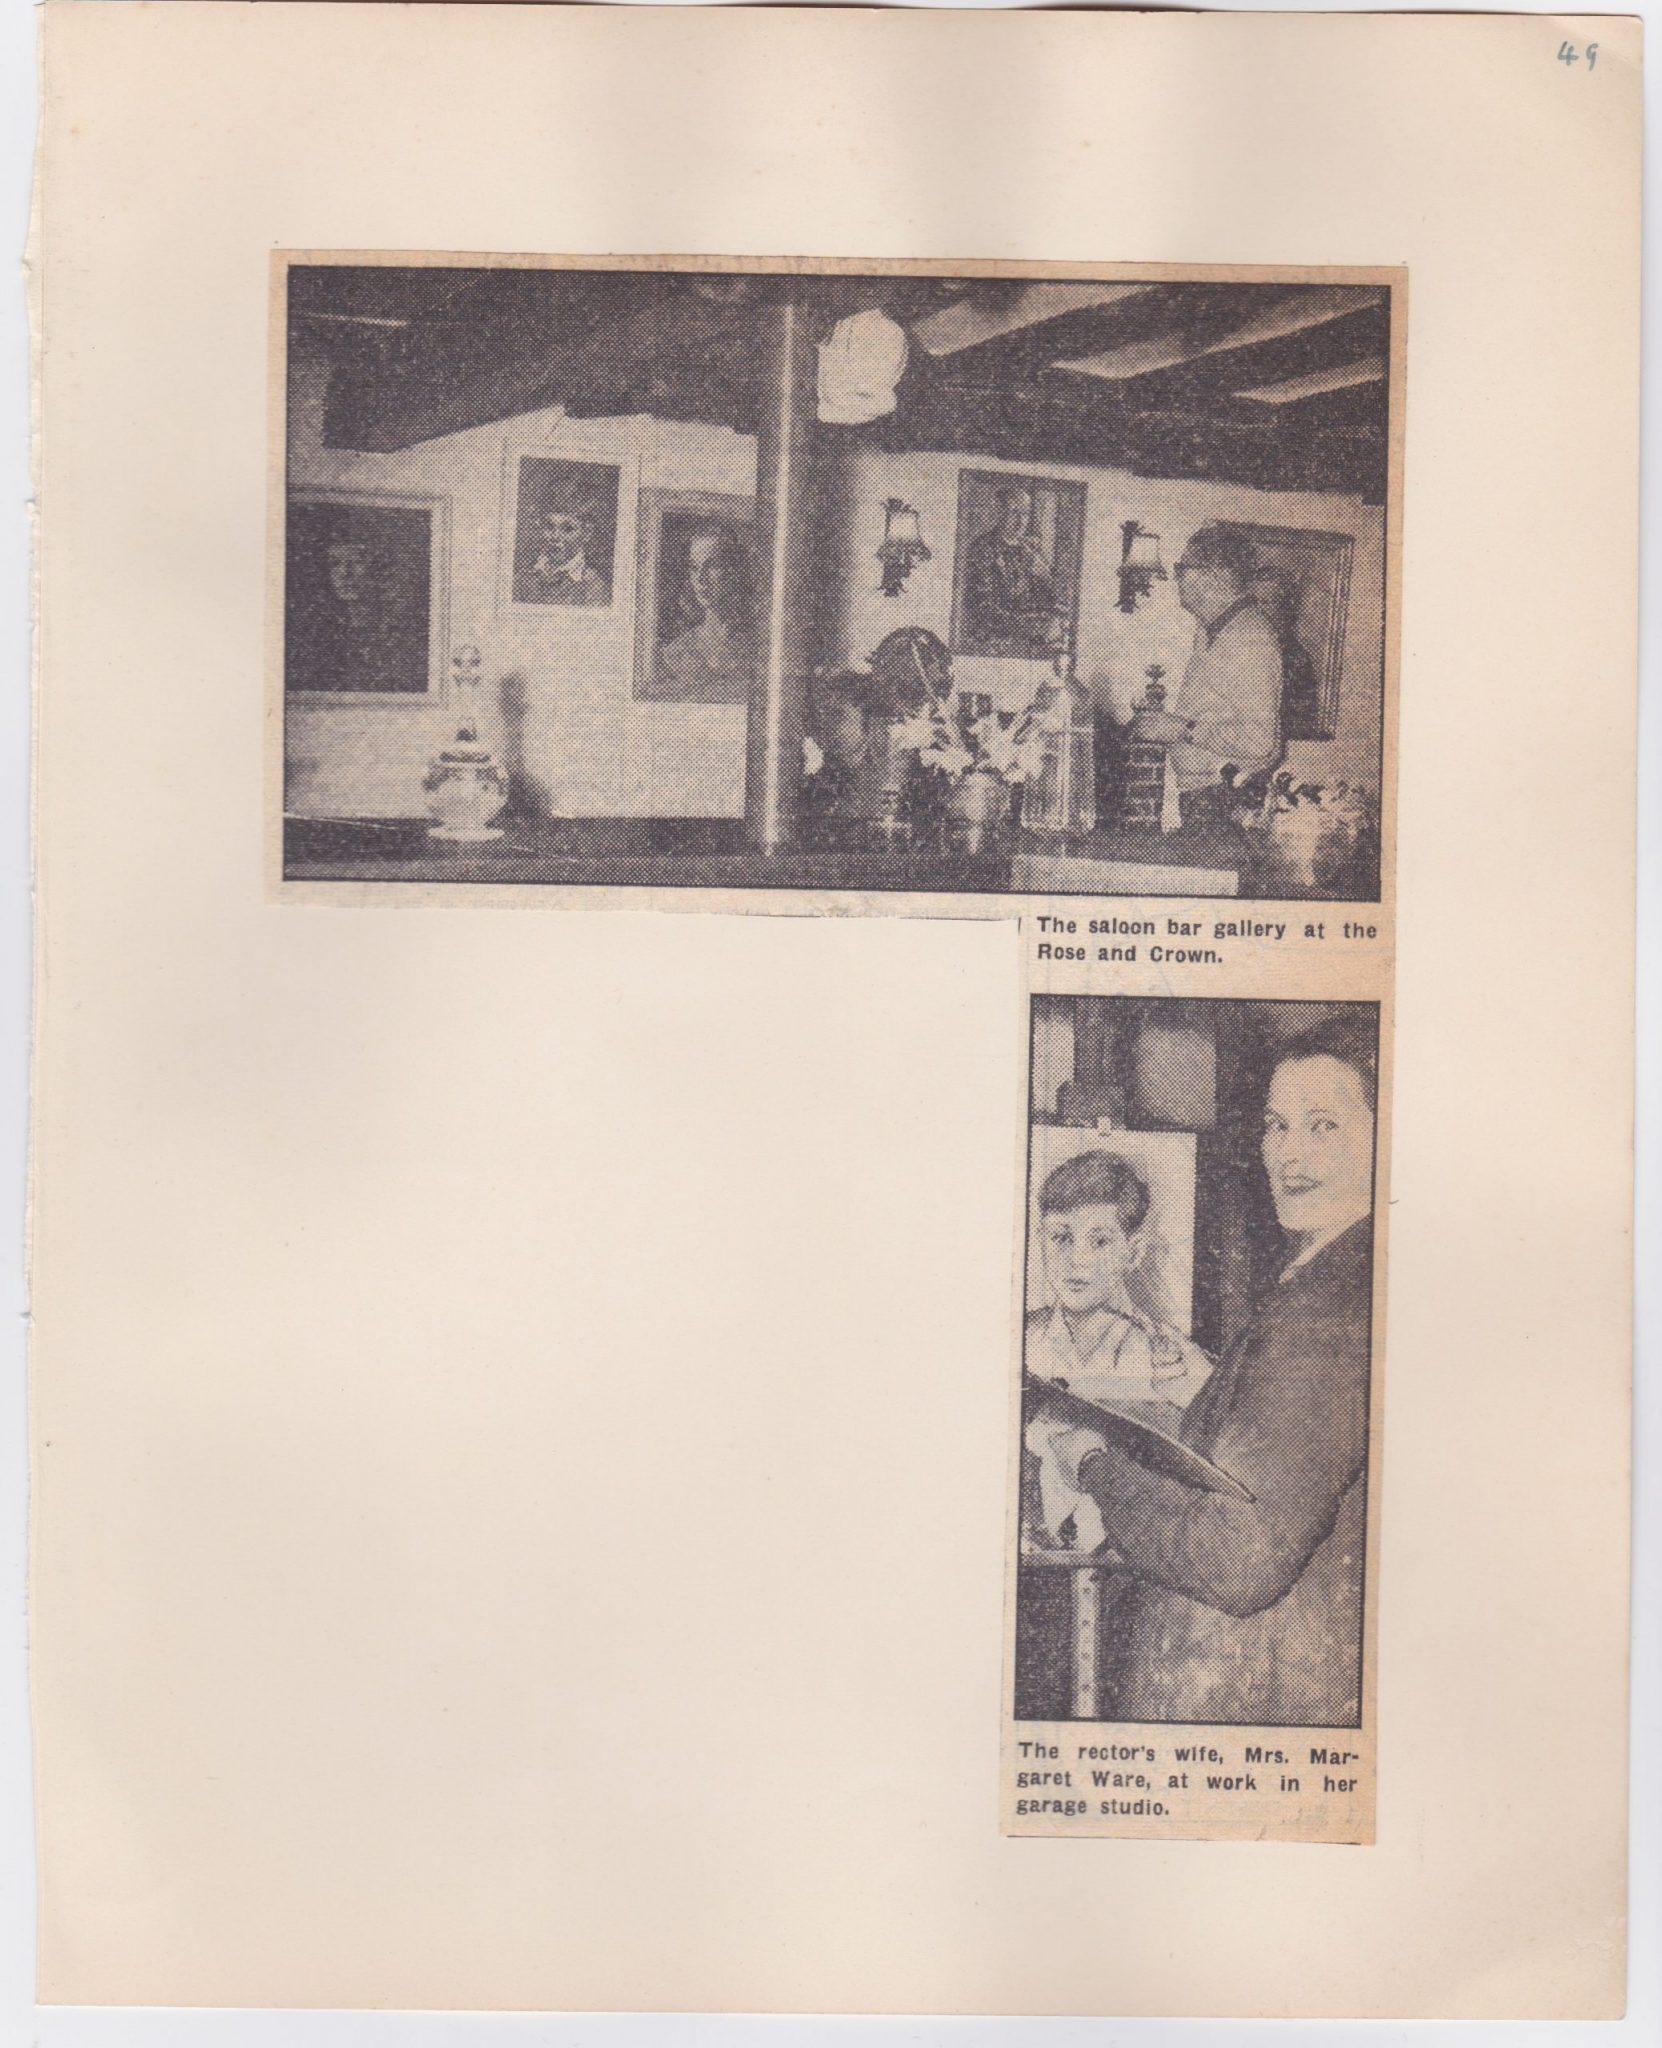 A Pub History Scrapbook Archive 16